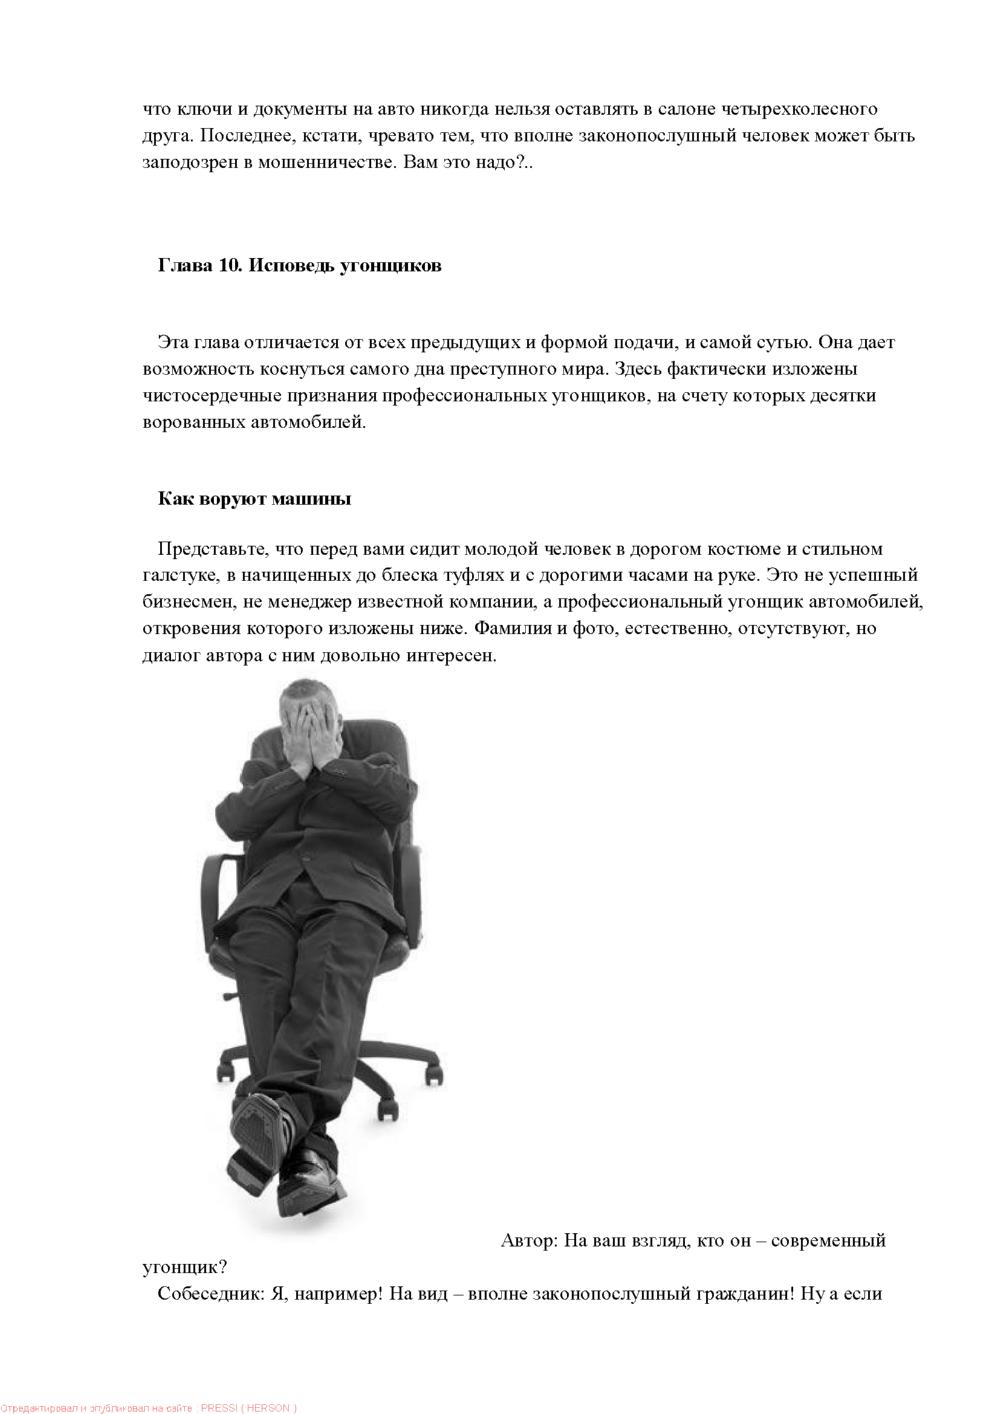 http://i6.imageban.ru/out/2013/12/05/b434b3435fded3e65dc678e2602bd8d6.jpg